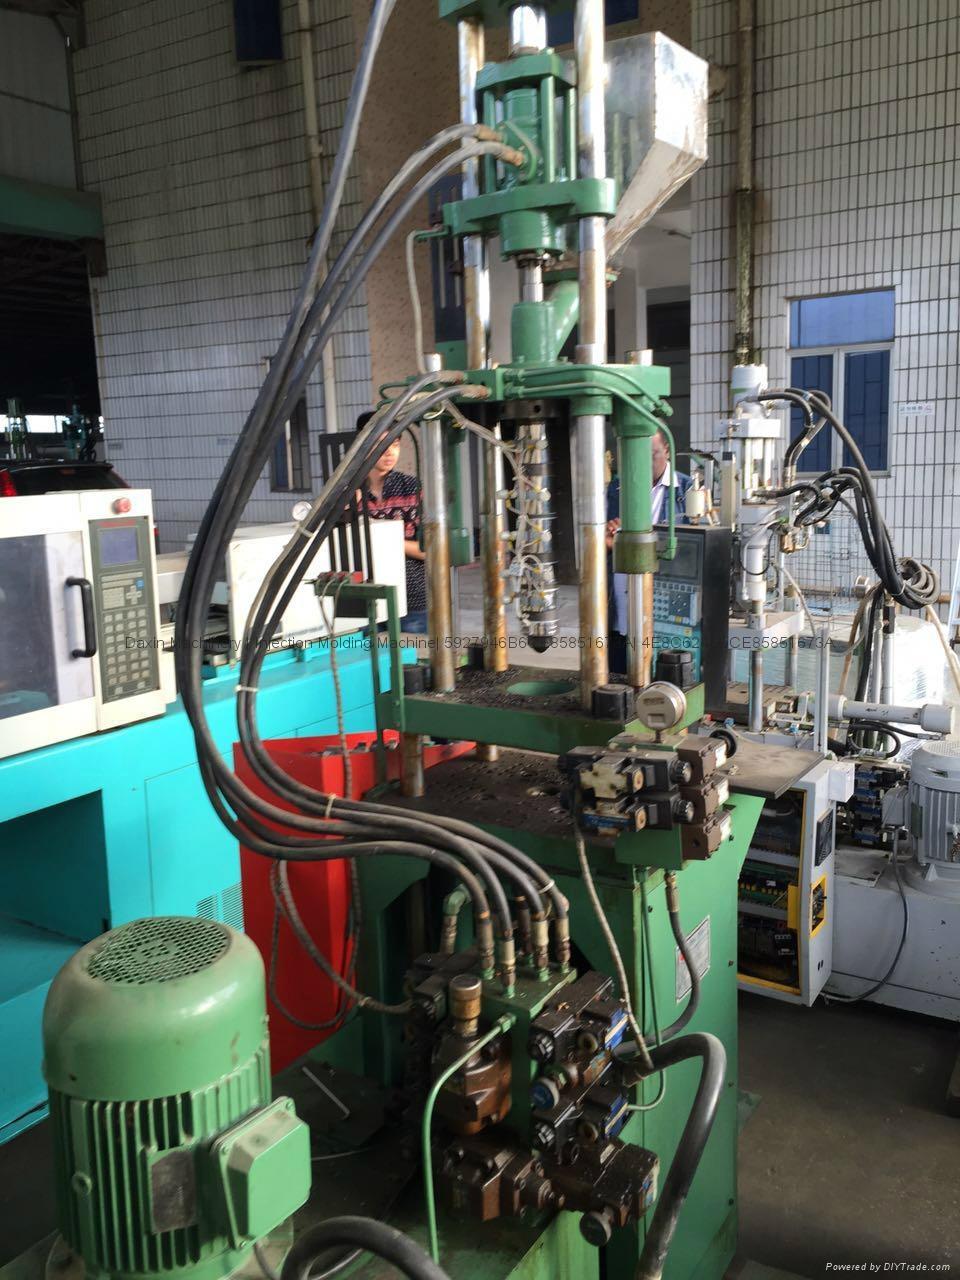 Kinki 25t used Vertical Injection Molding Machine